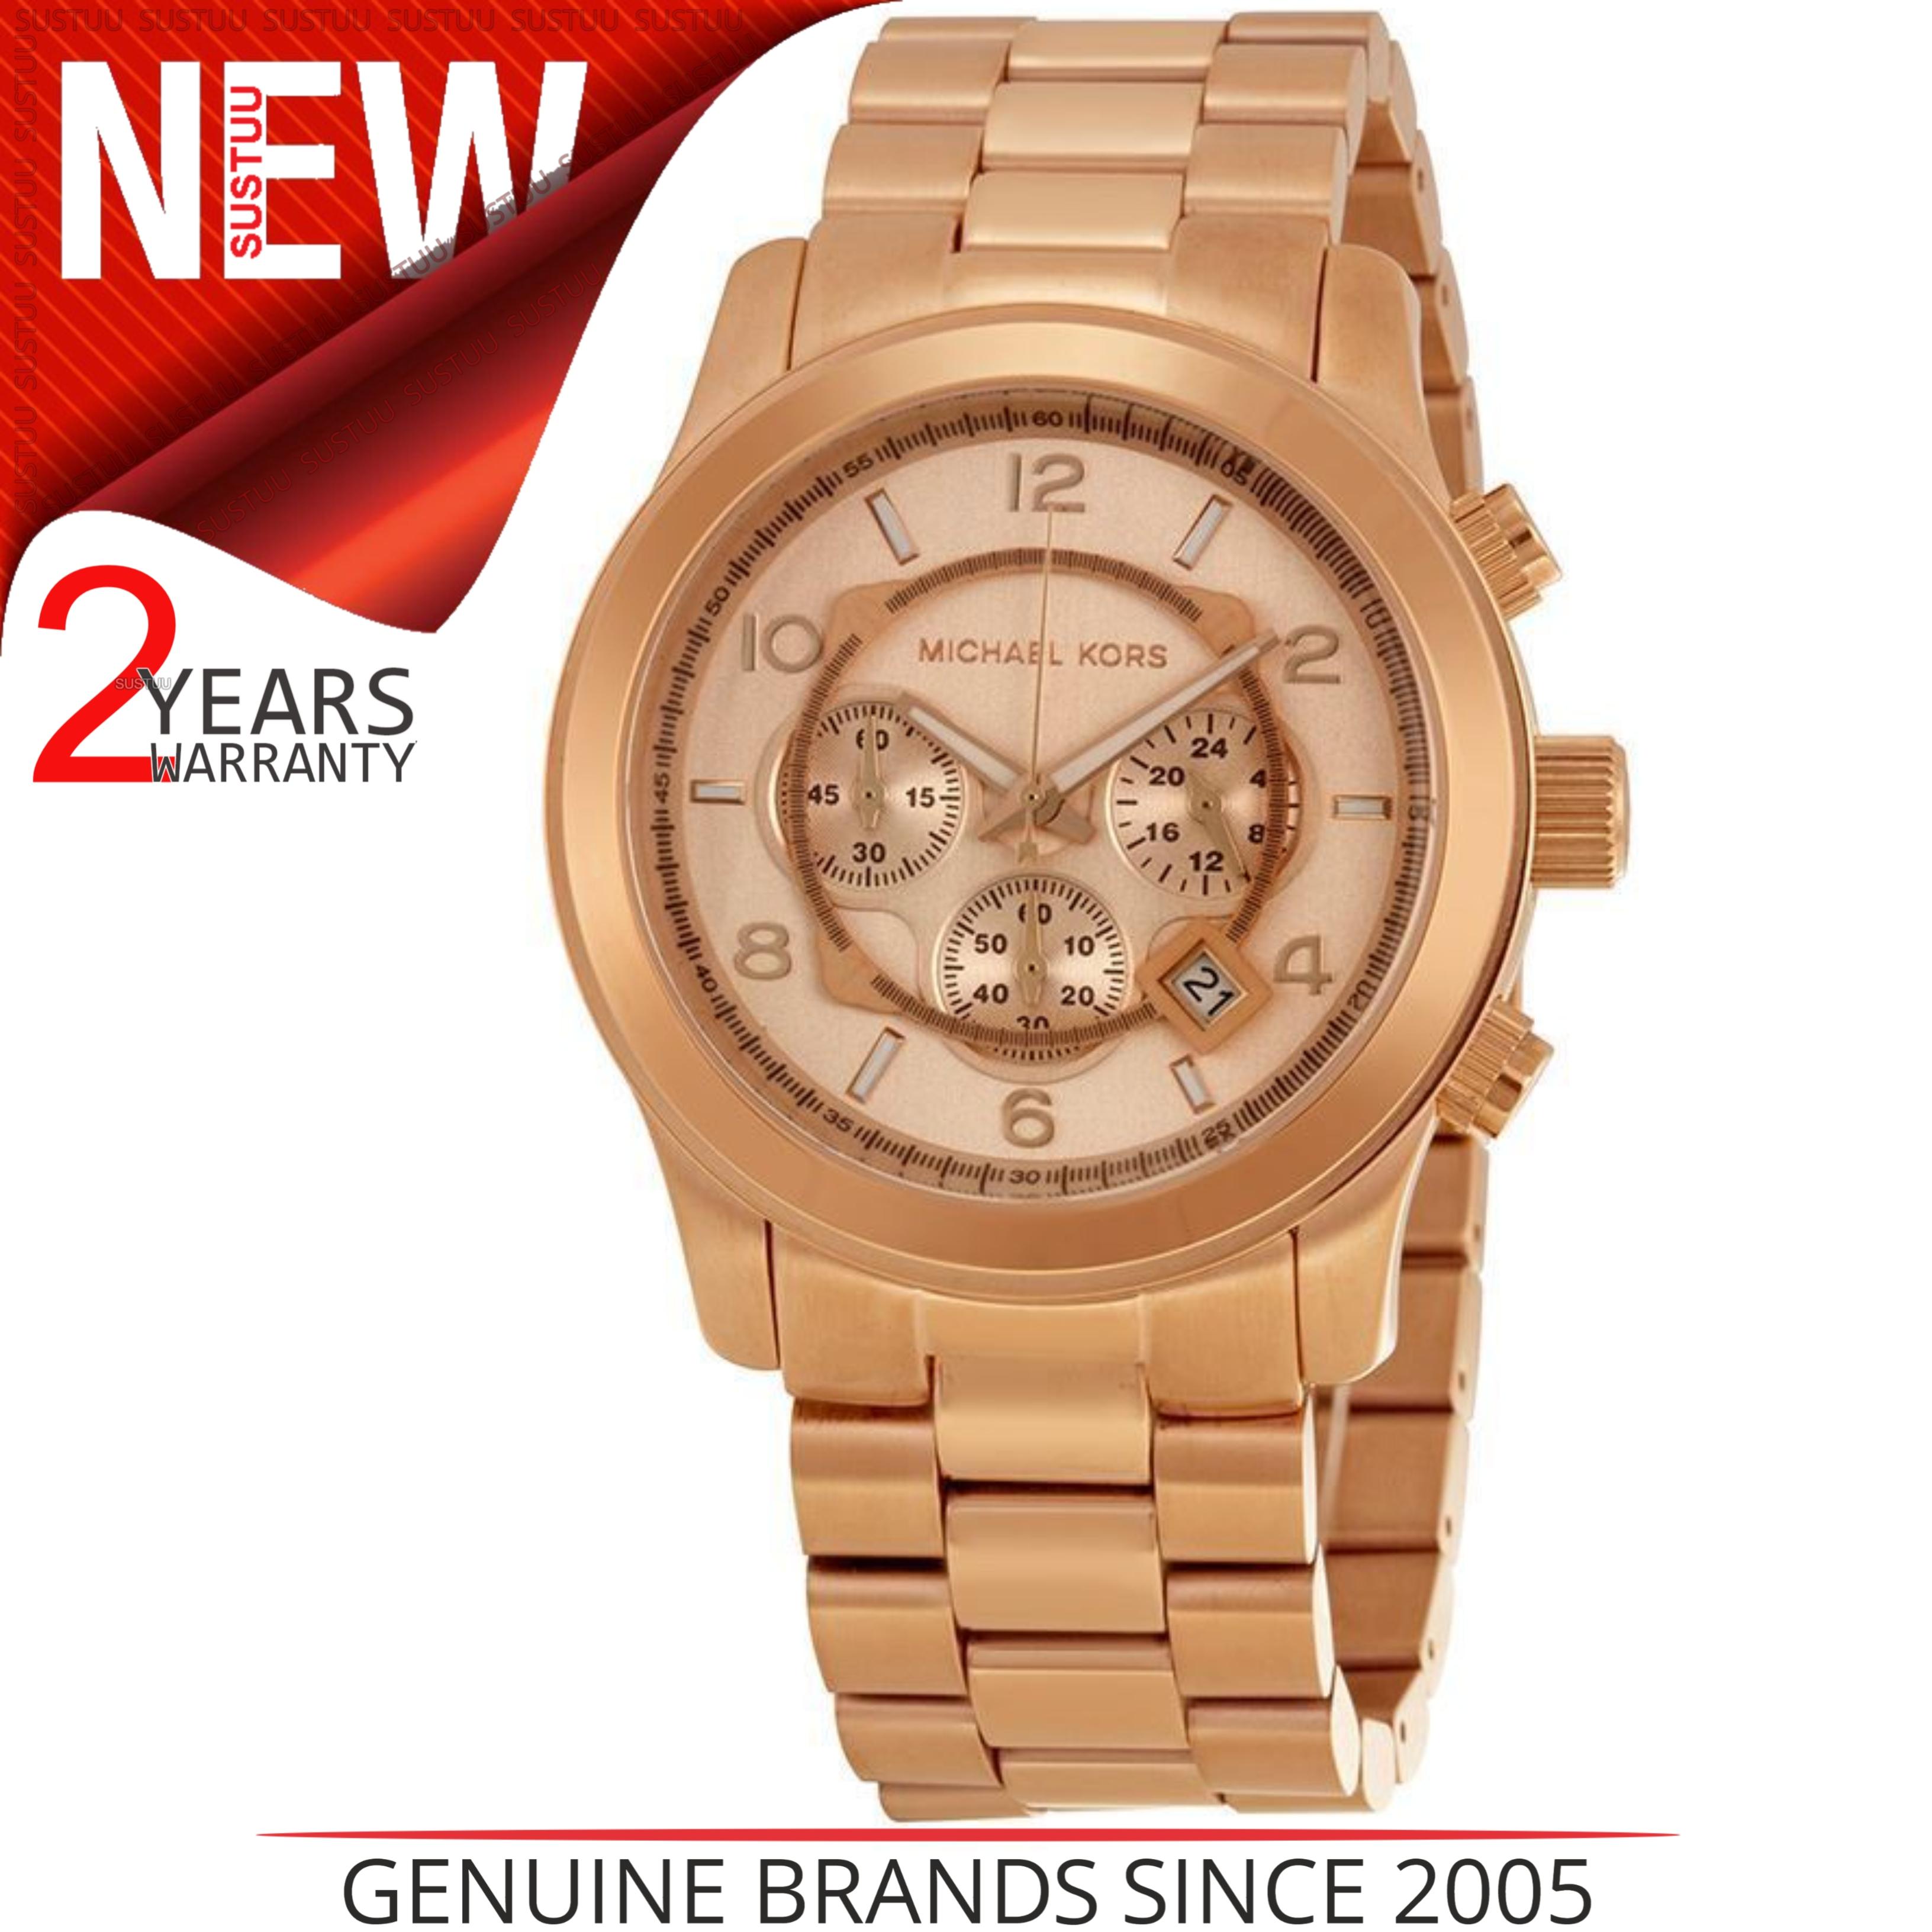 94dacb3654bb Details about Michael Kors Ladies Runway Watch MK8096│Chronograph│Rose Gold  Tone Designer